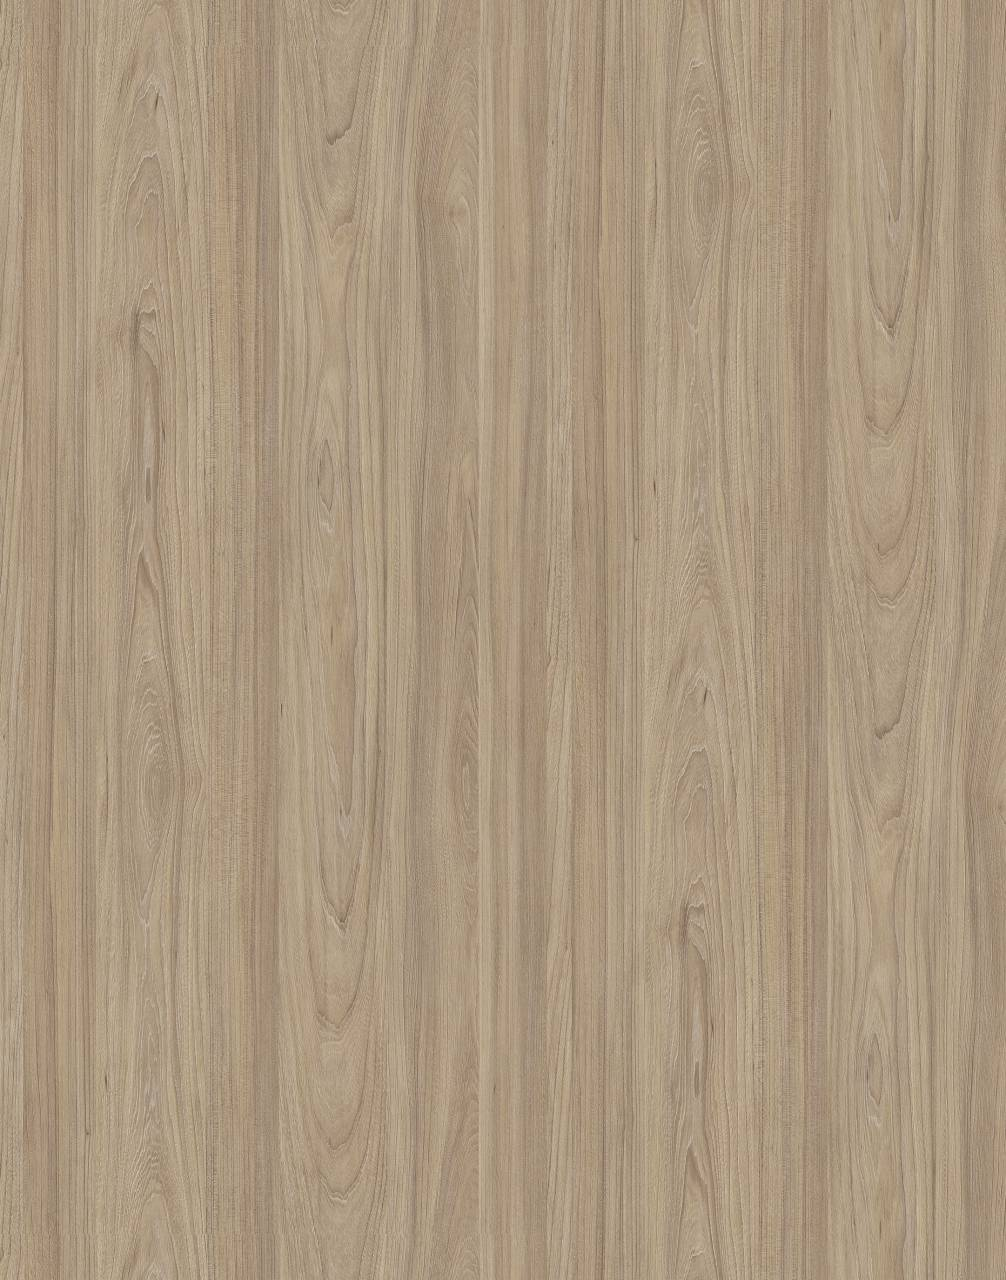 5500 Natural Noble Elm (MF PB sample)